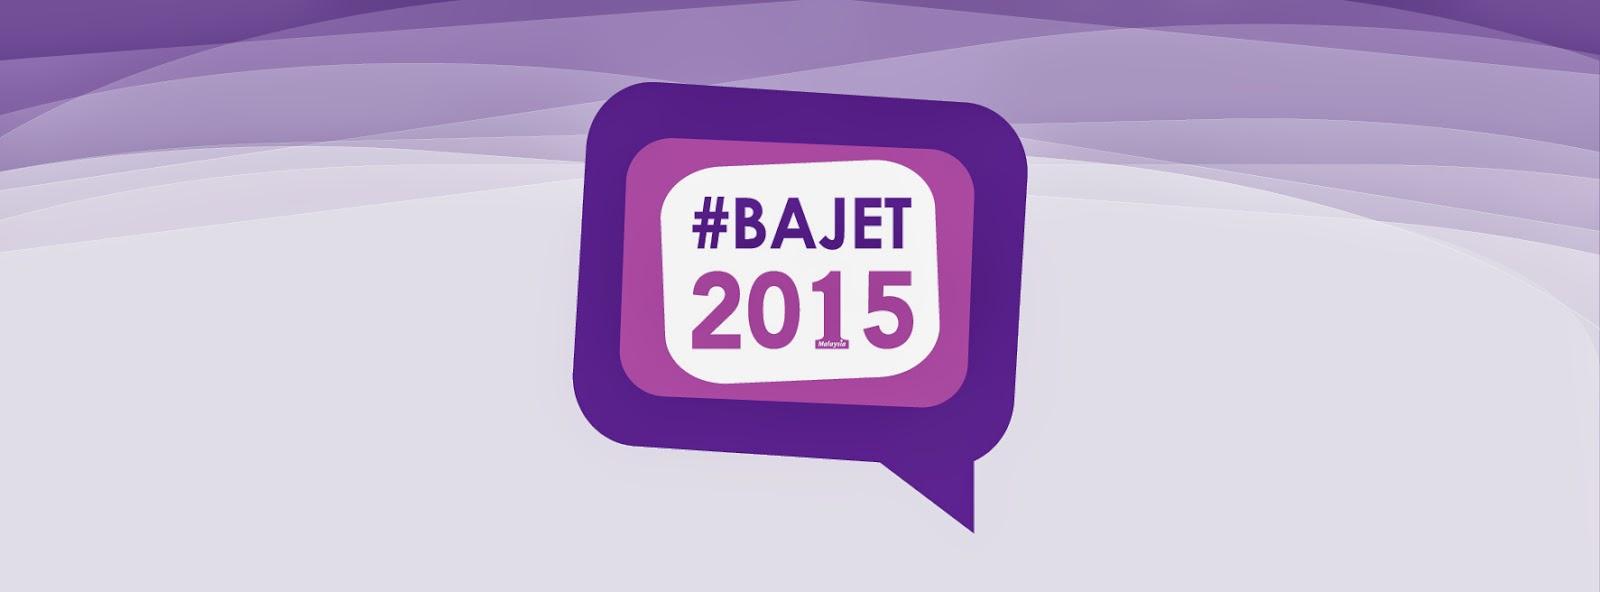 bajet2015